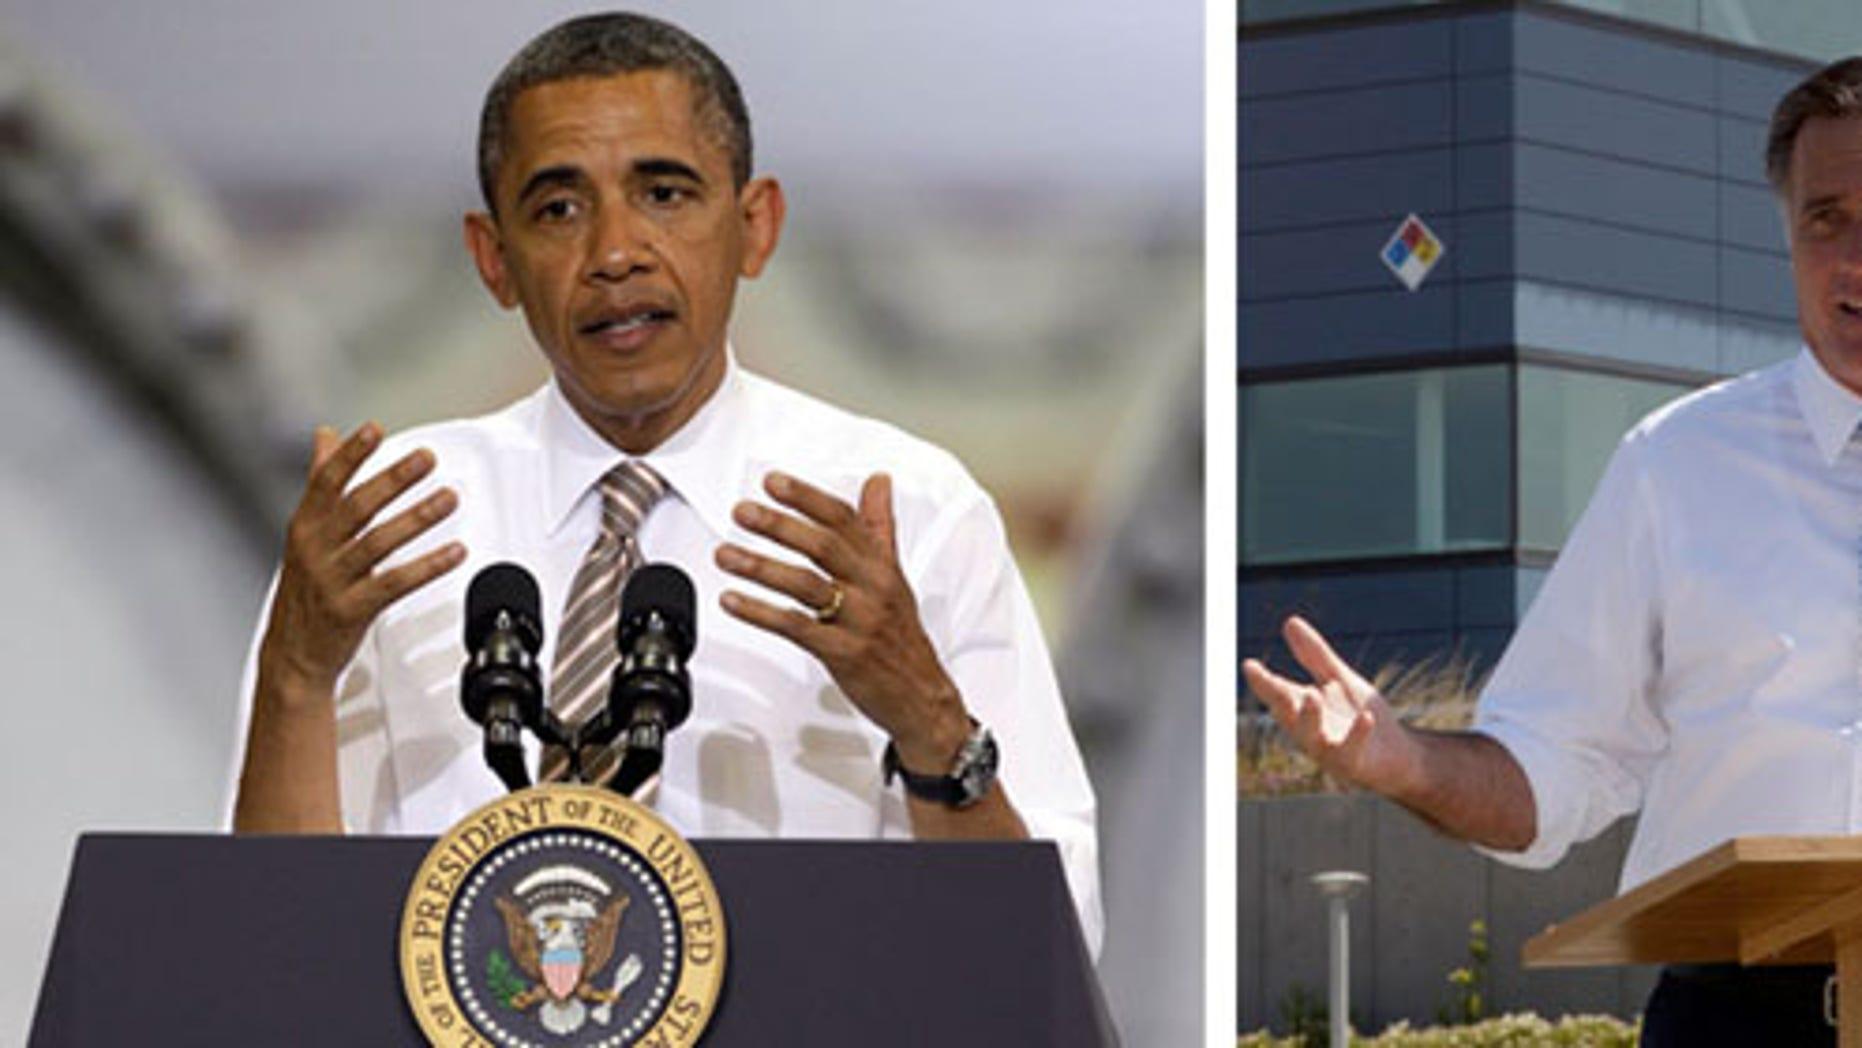 President Barack Obama, left, and Republican presidential candidate Mitt Romney.